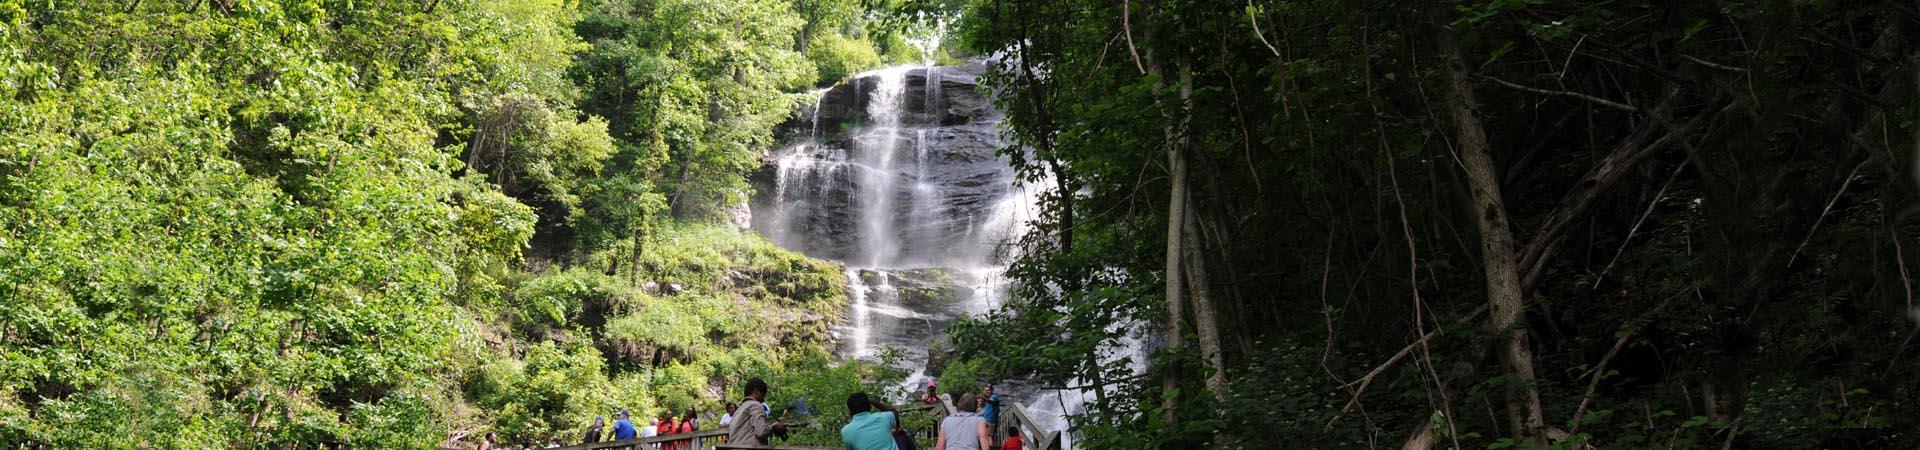 Amicalola Falls picture